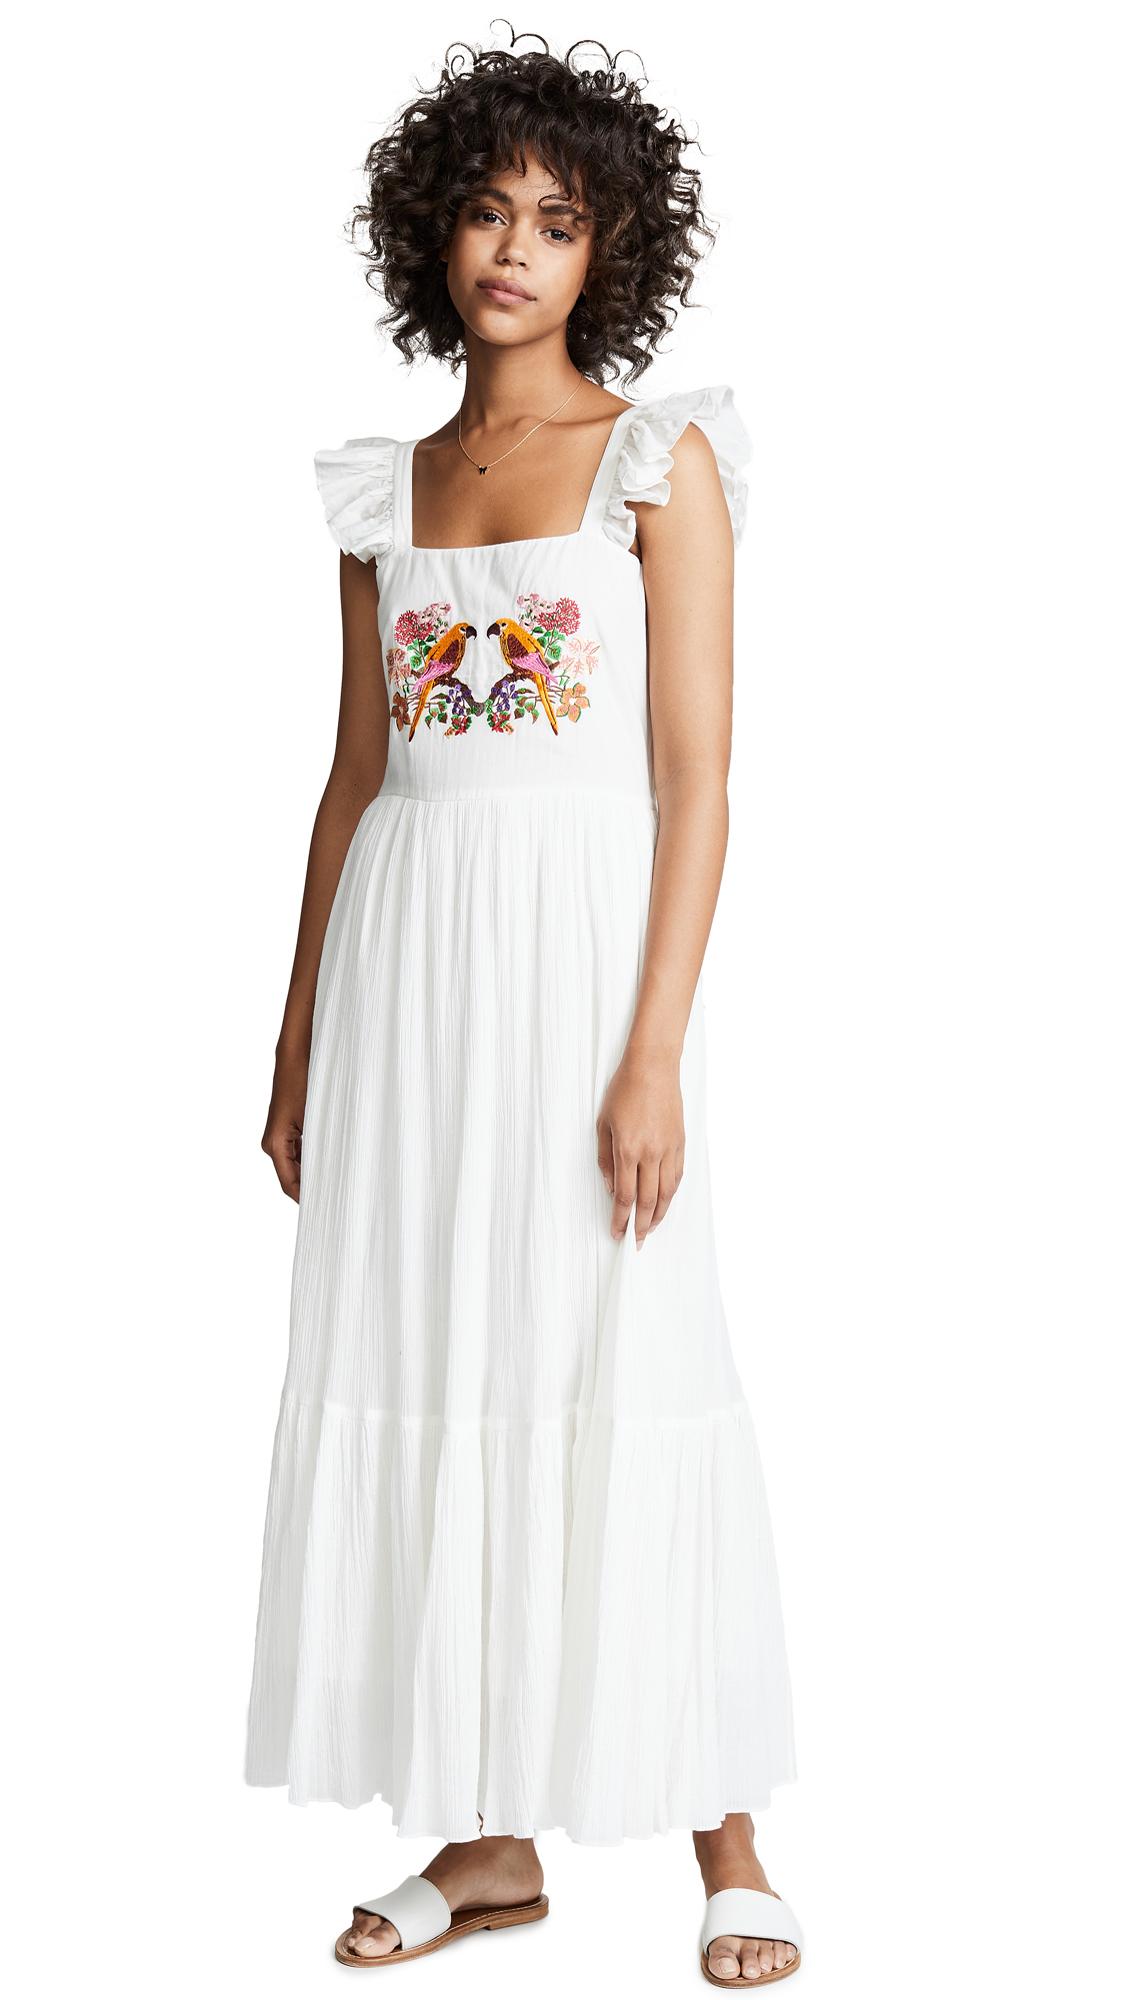 CAROLINA K Kuna Dress in Parrot Embroidery White